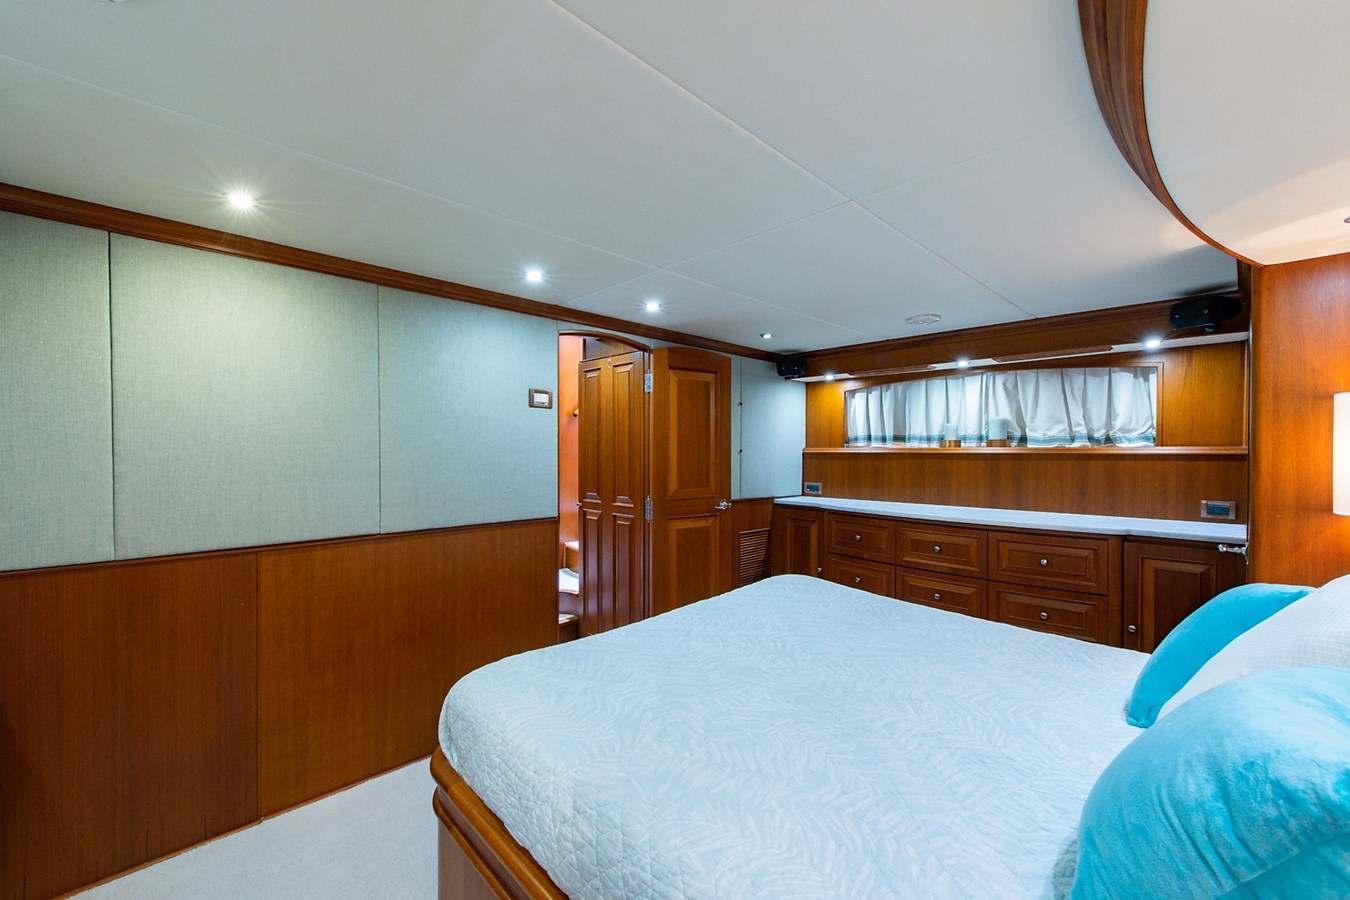 Tout Va Bien_Master Stateroom5 2005 GRAND BANKS 64 Aleutian RP Motor Yacht 2726161